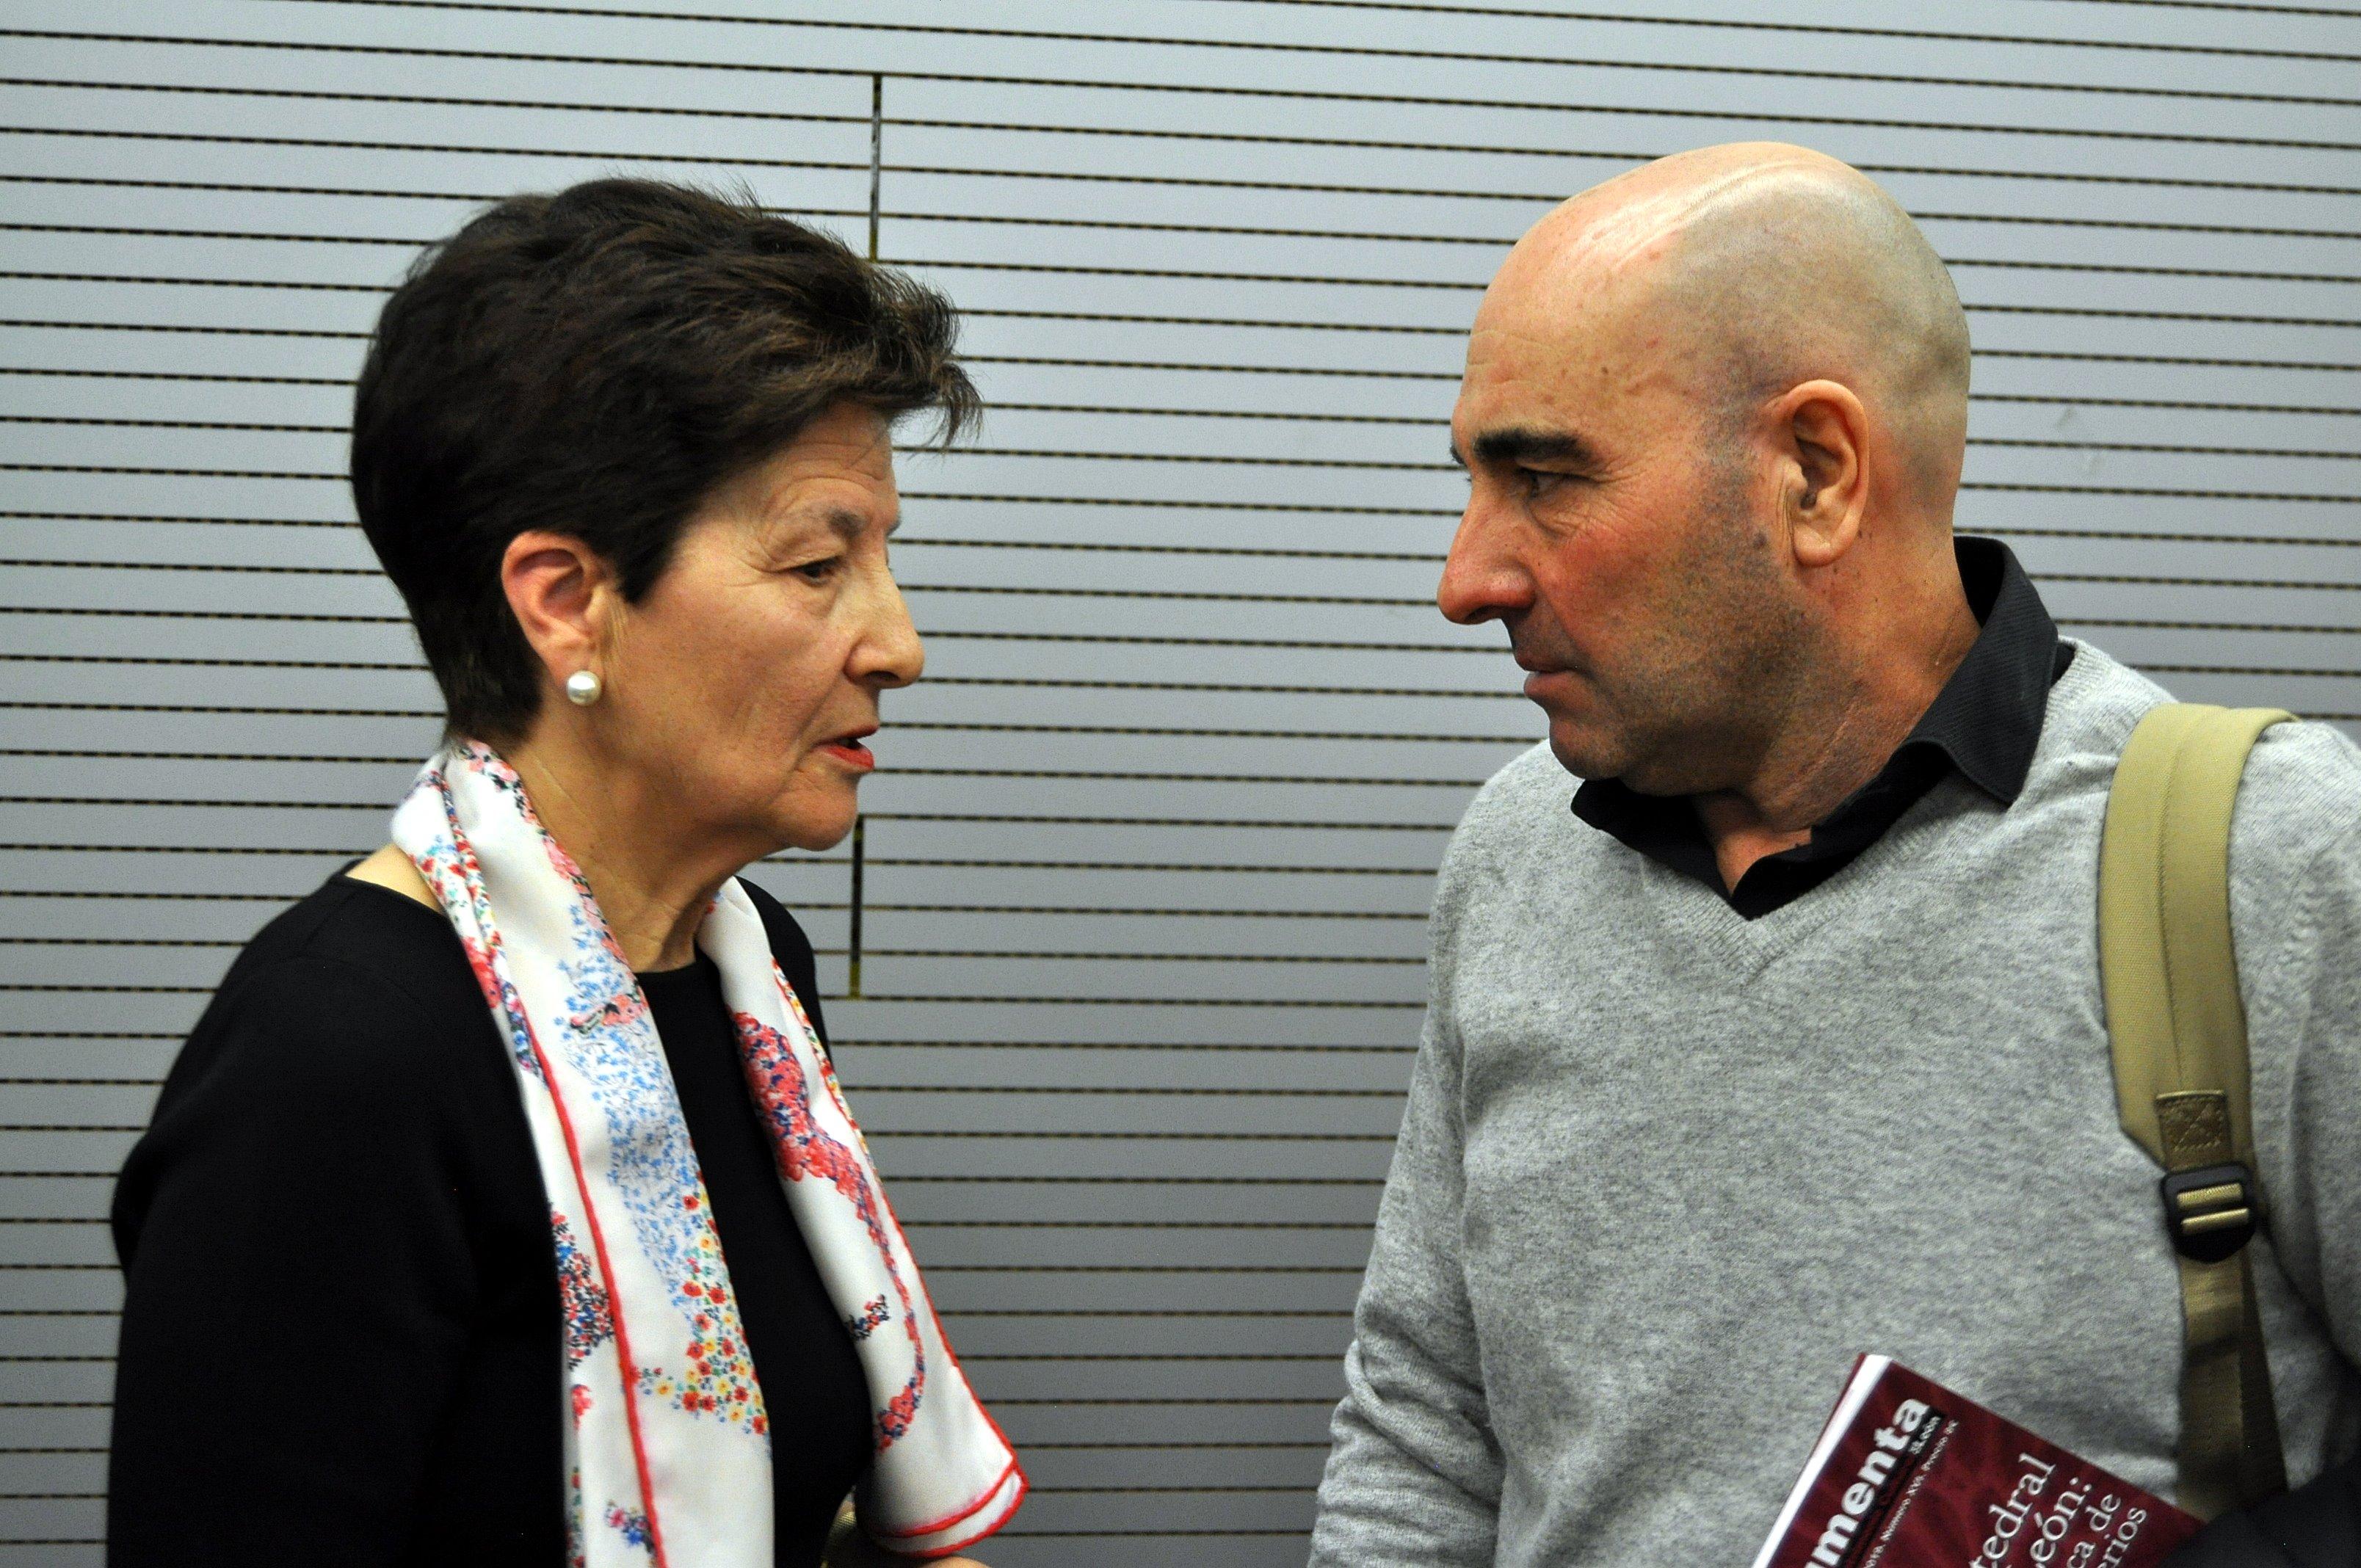 Gregoria Cavero y Javier Caballero Chica.